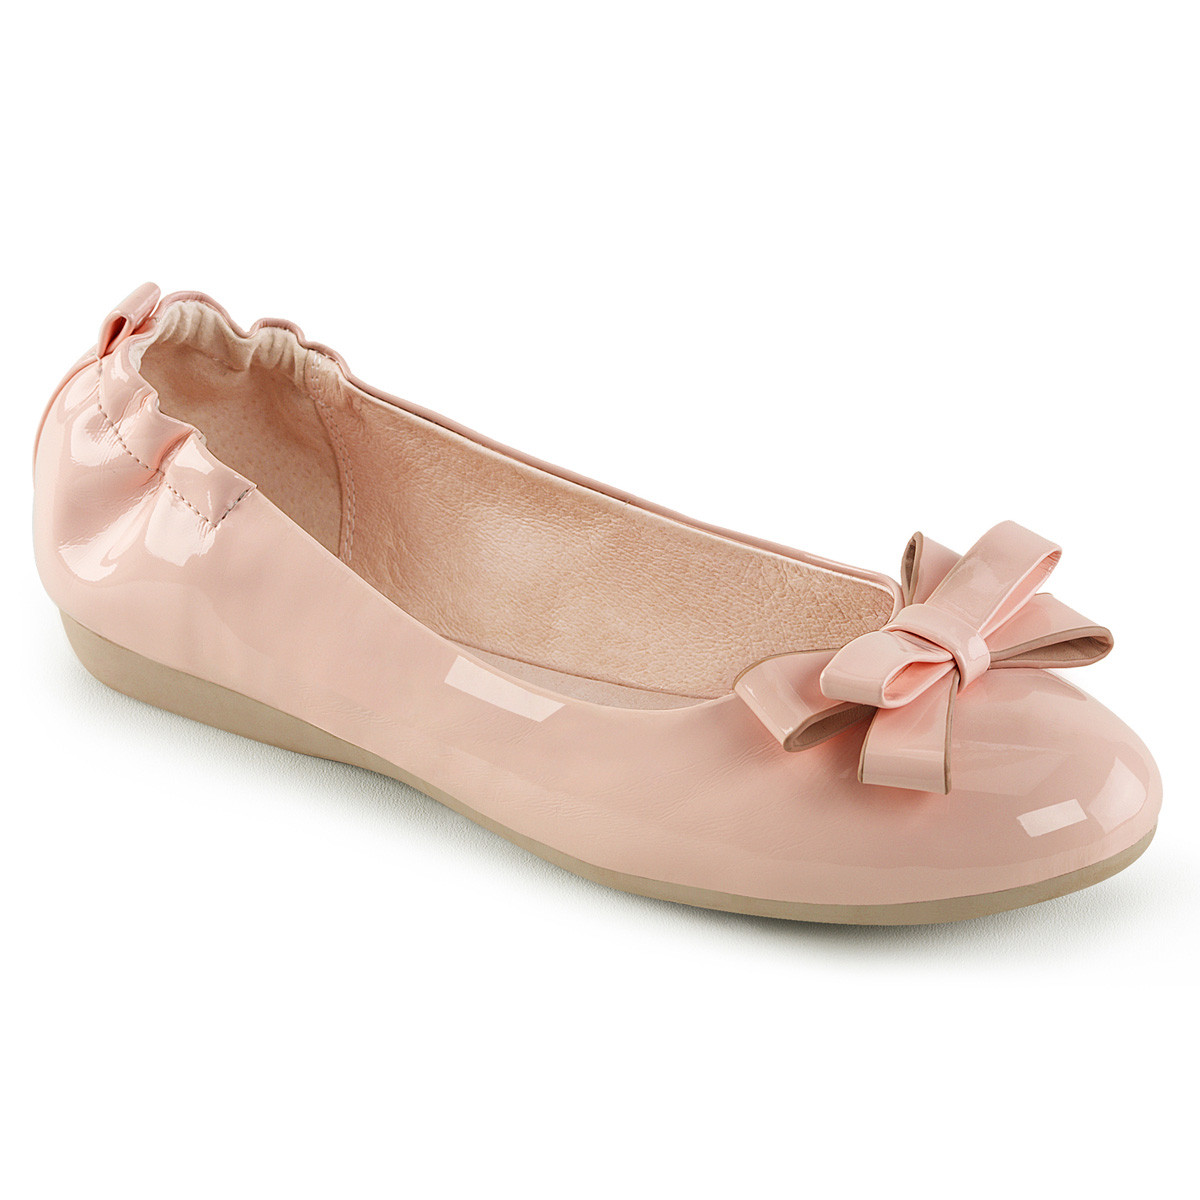 Ballerinas - OLIVE 03 ° Damen Ballerina ° Babypink ° Lack ° Pin Up Couture  - Onlineshop RedSixty